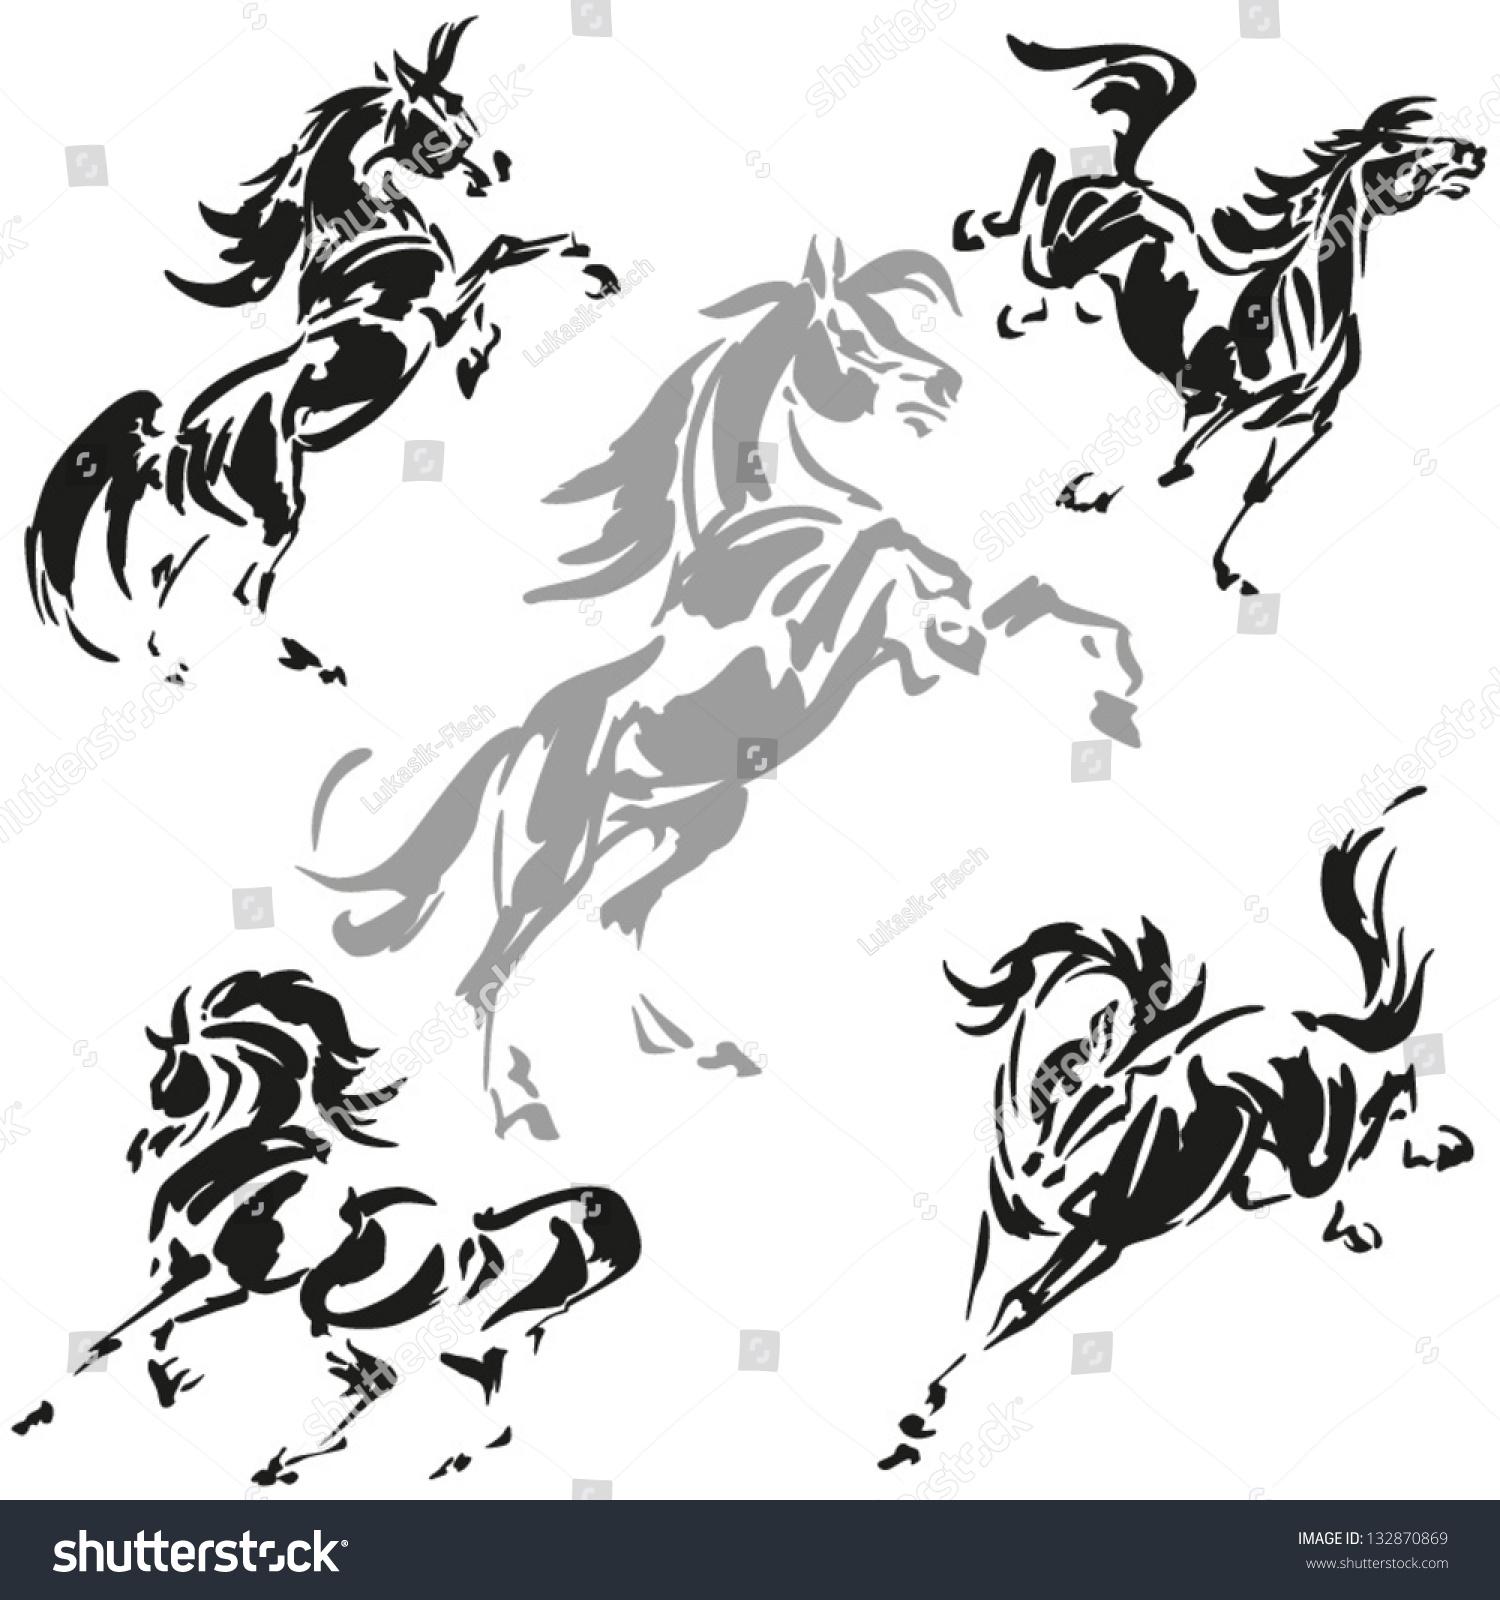 Running Horses Silhouette Wall Border Stock Vector Rearing And Prancing Horses Dynamic Brush